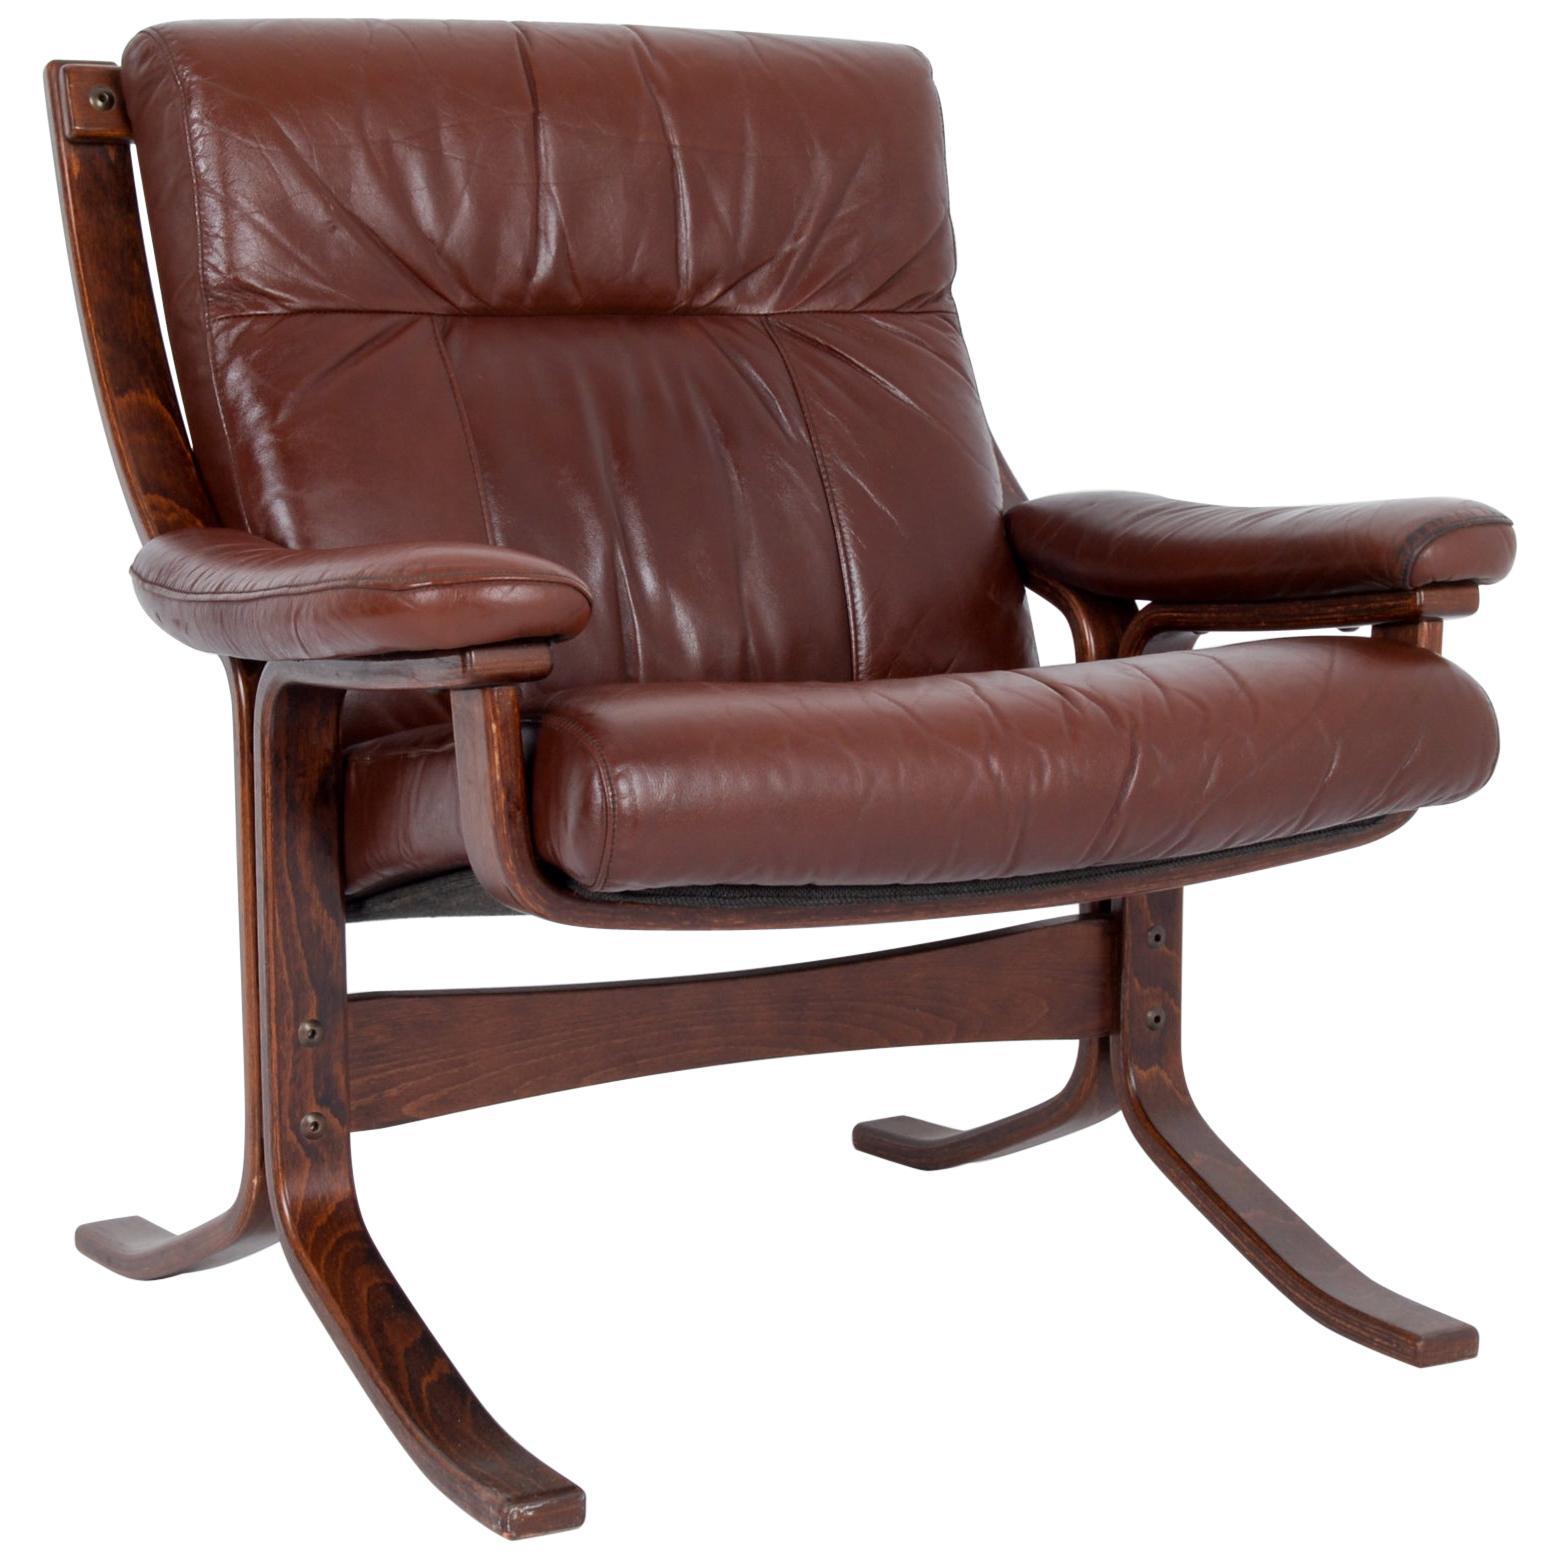 1970s Norwegian Leather Armchair